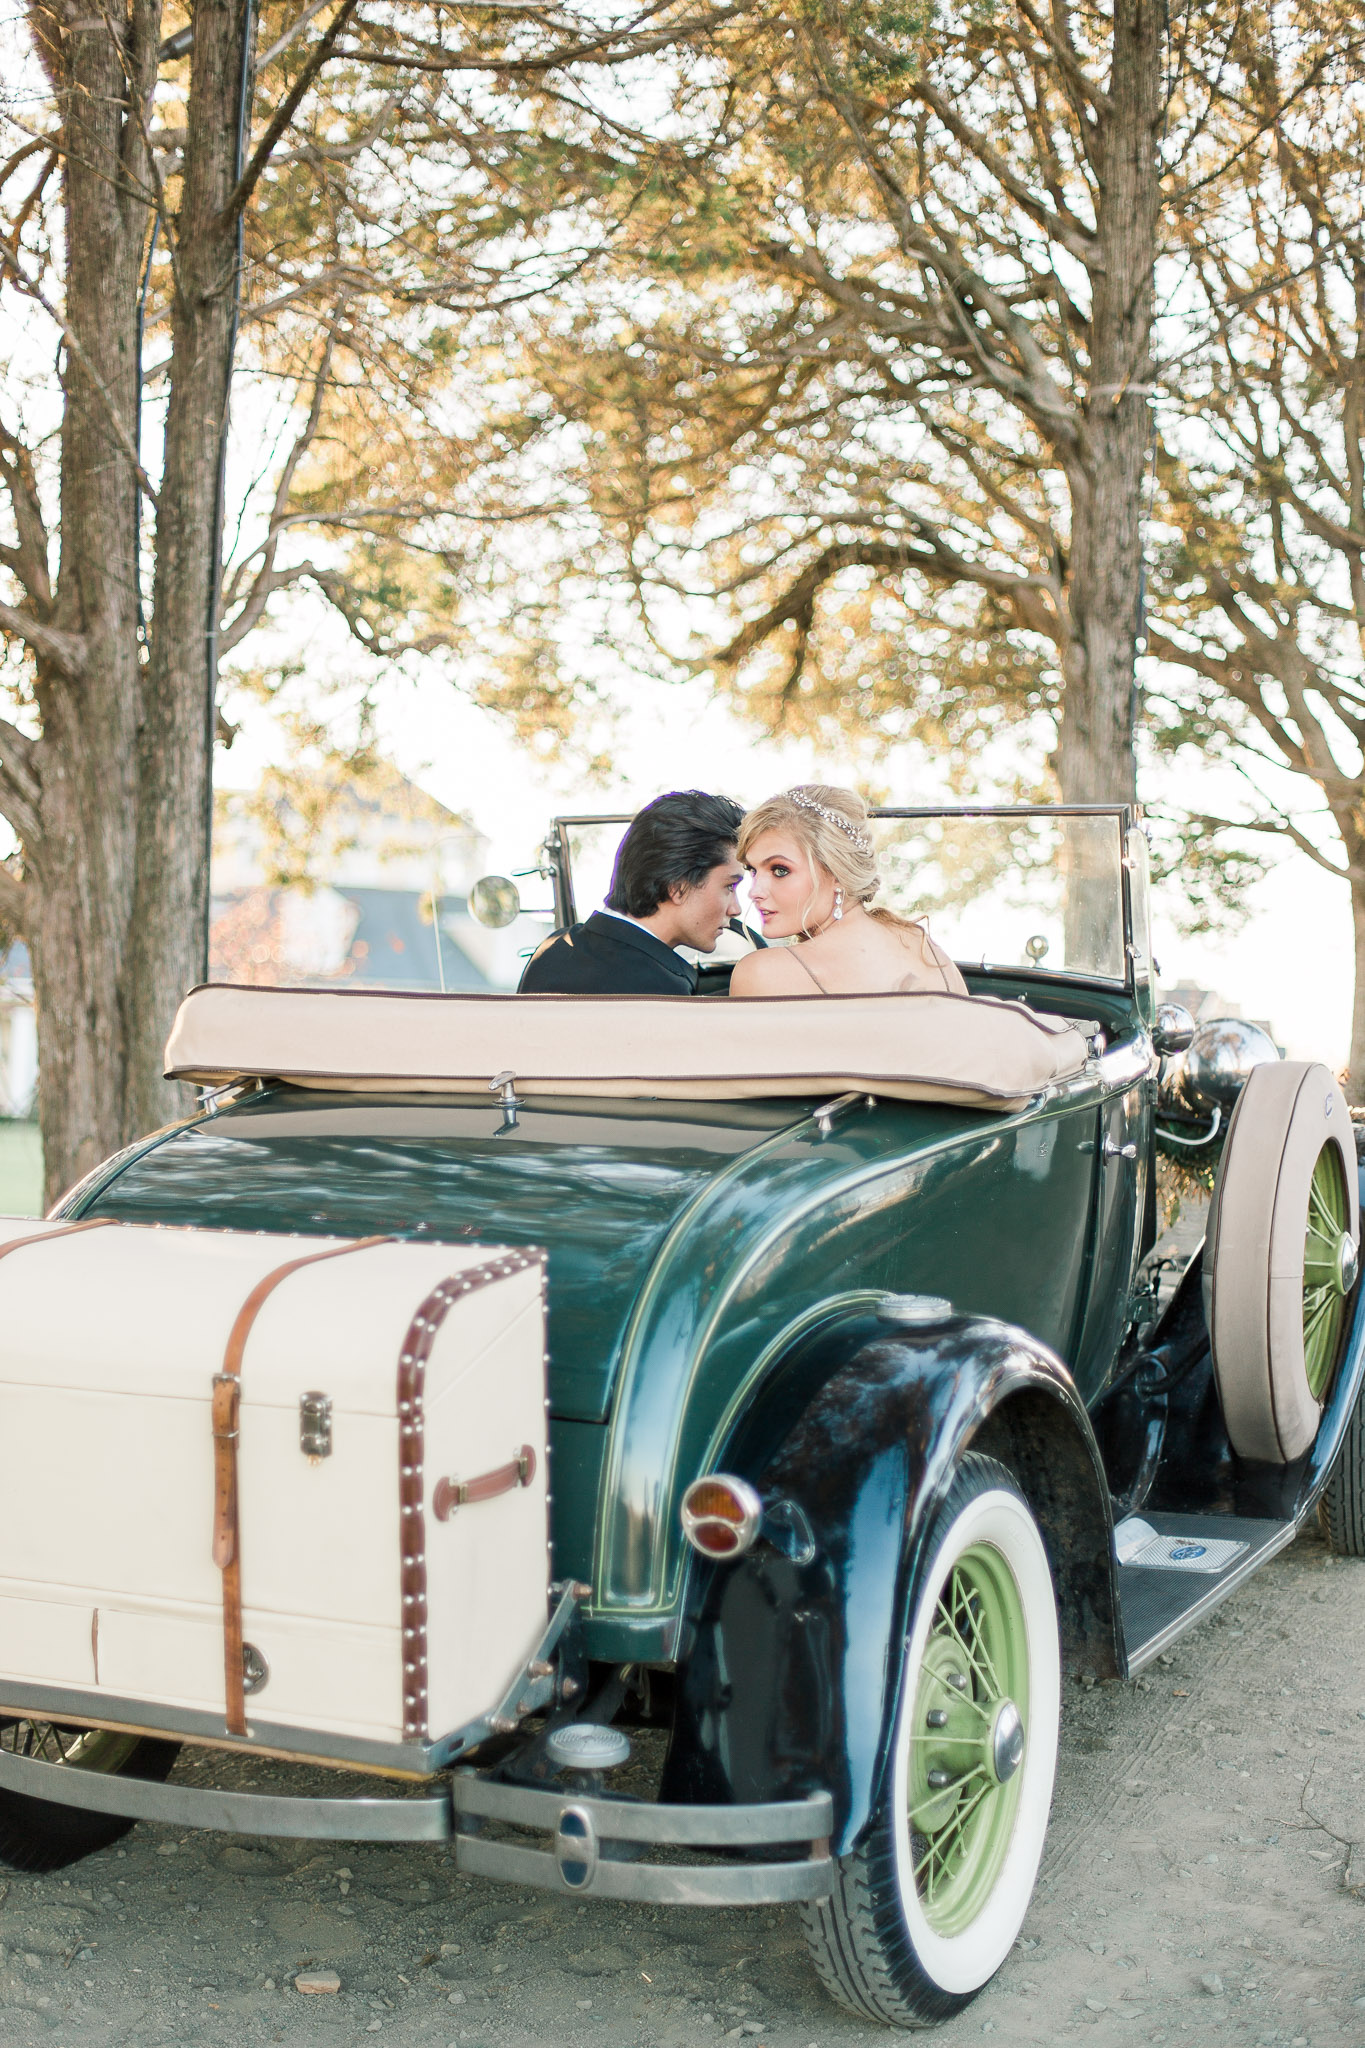 jays-model-a-dc-vintage-car-rental